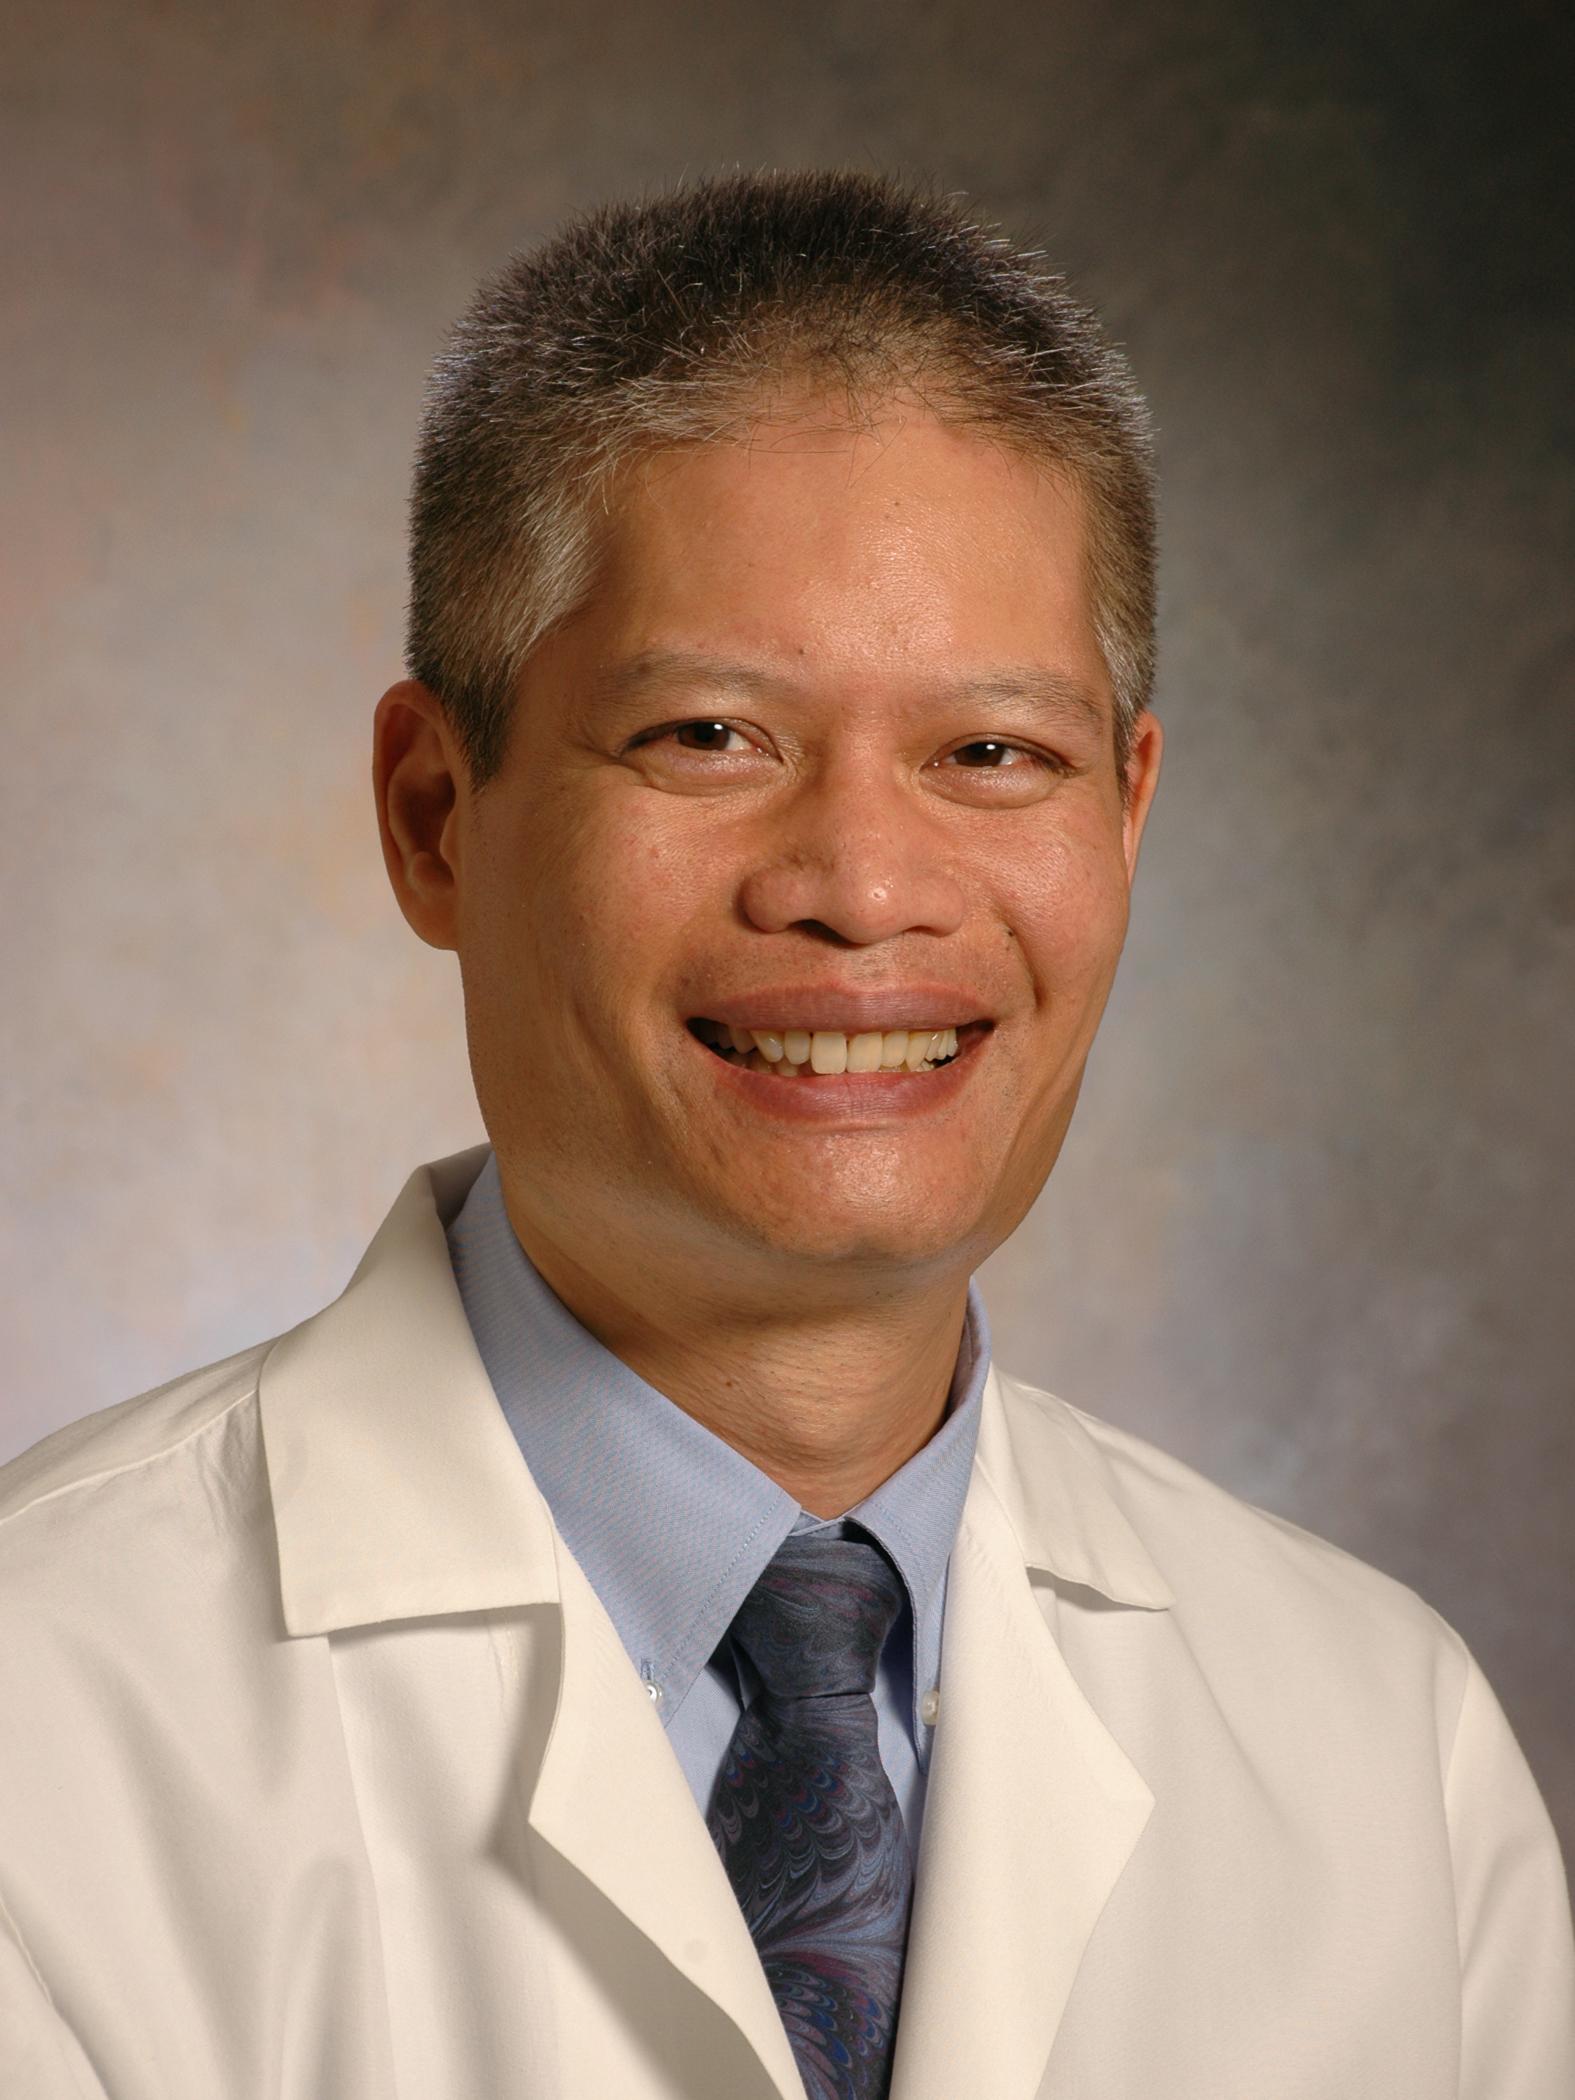 Dr. Marshall H. Chin